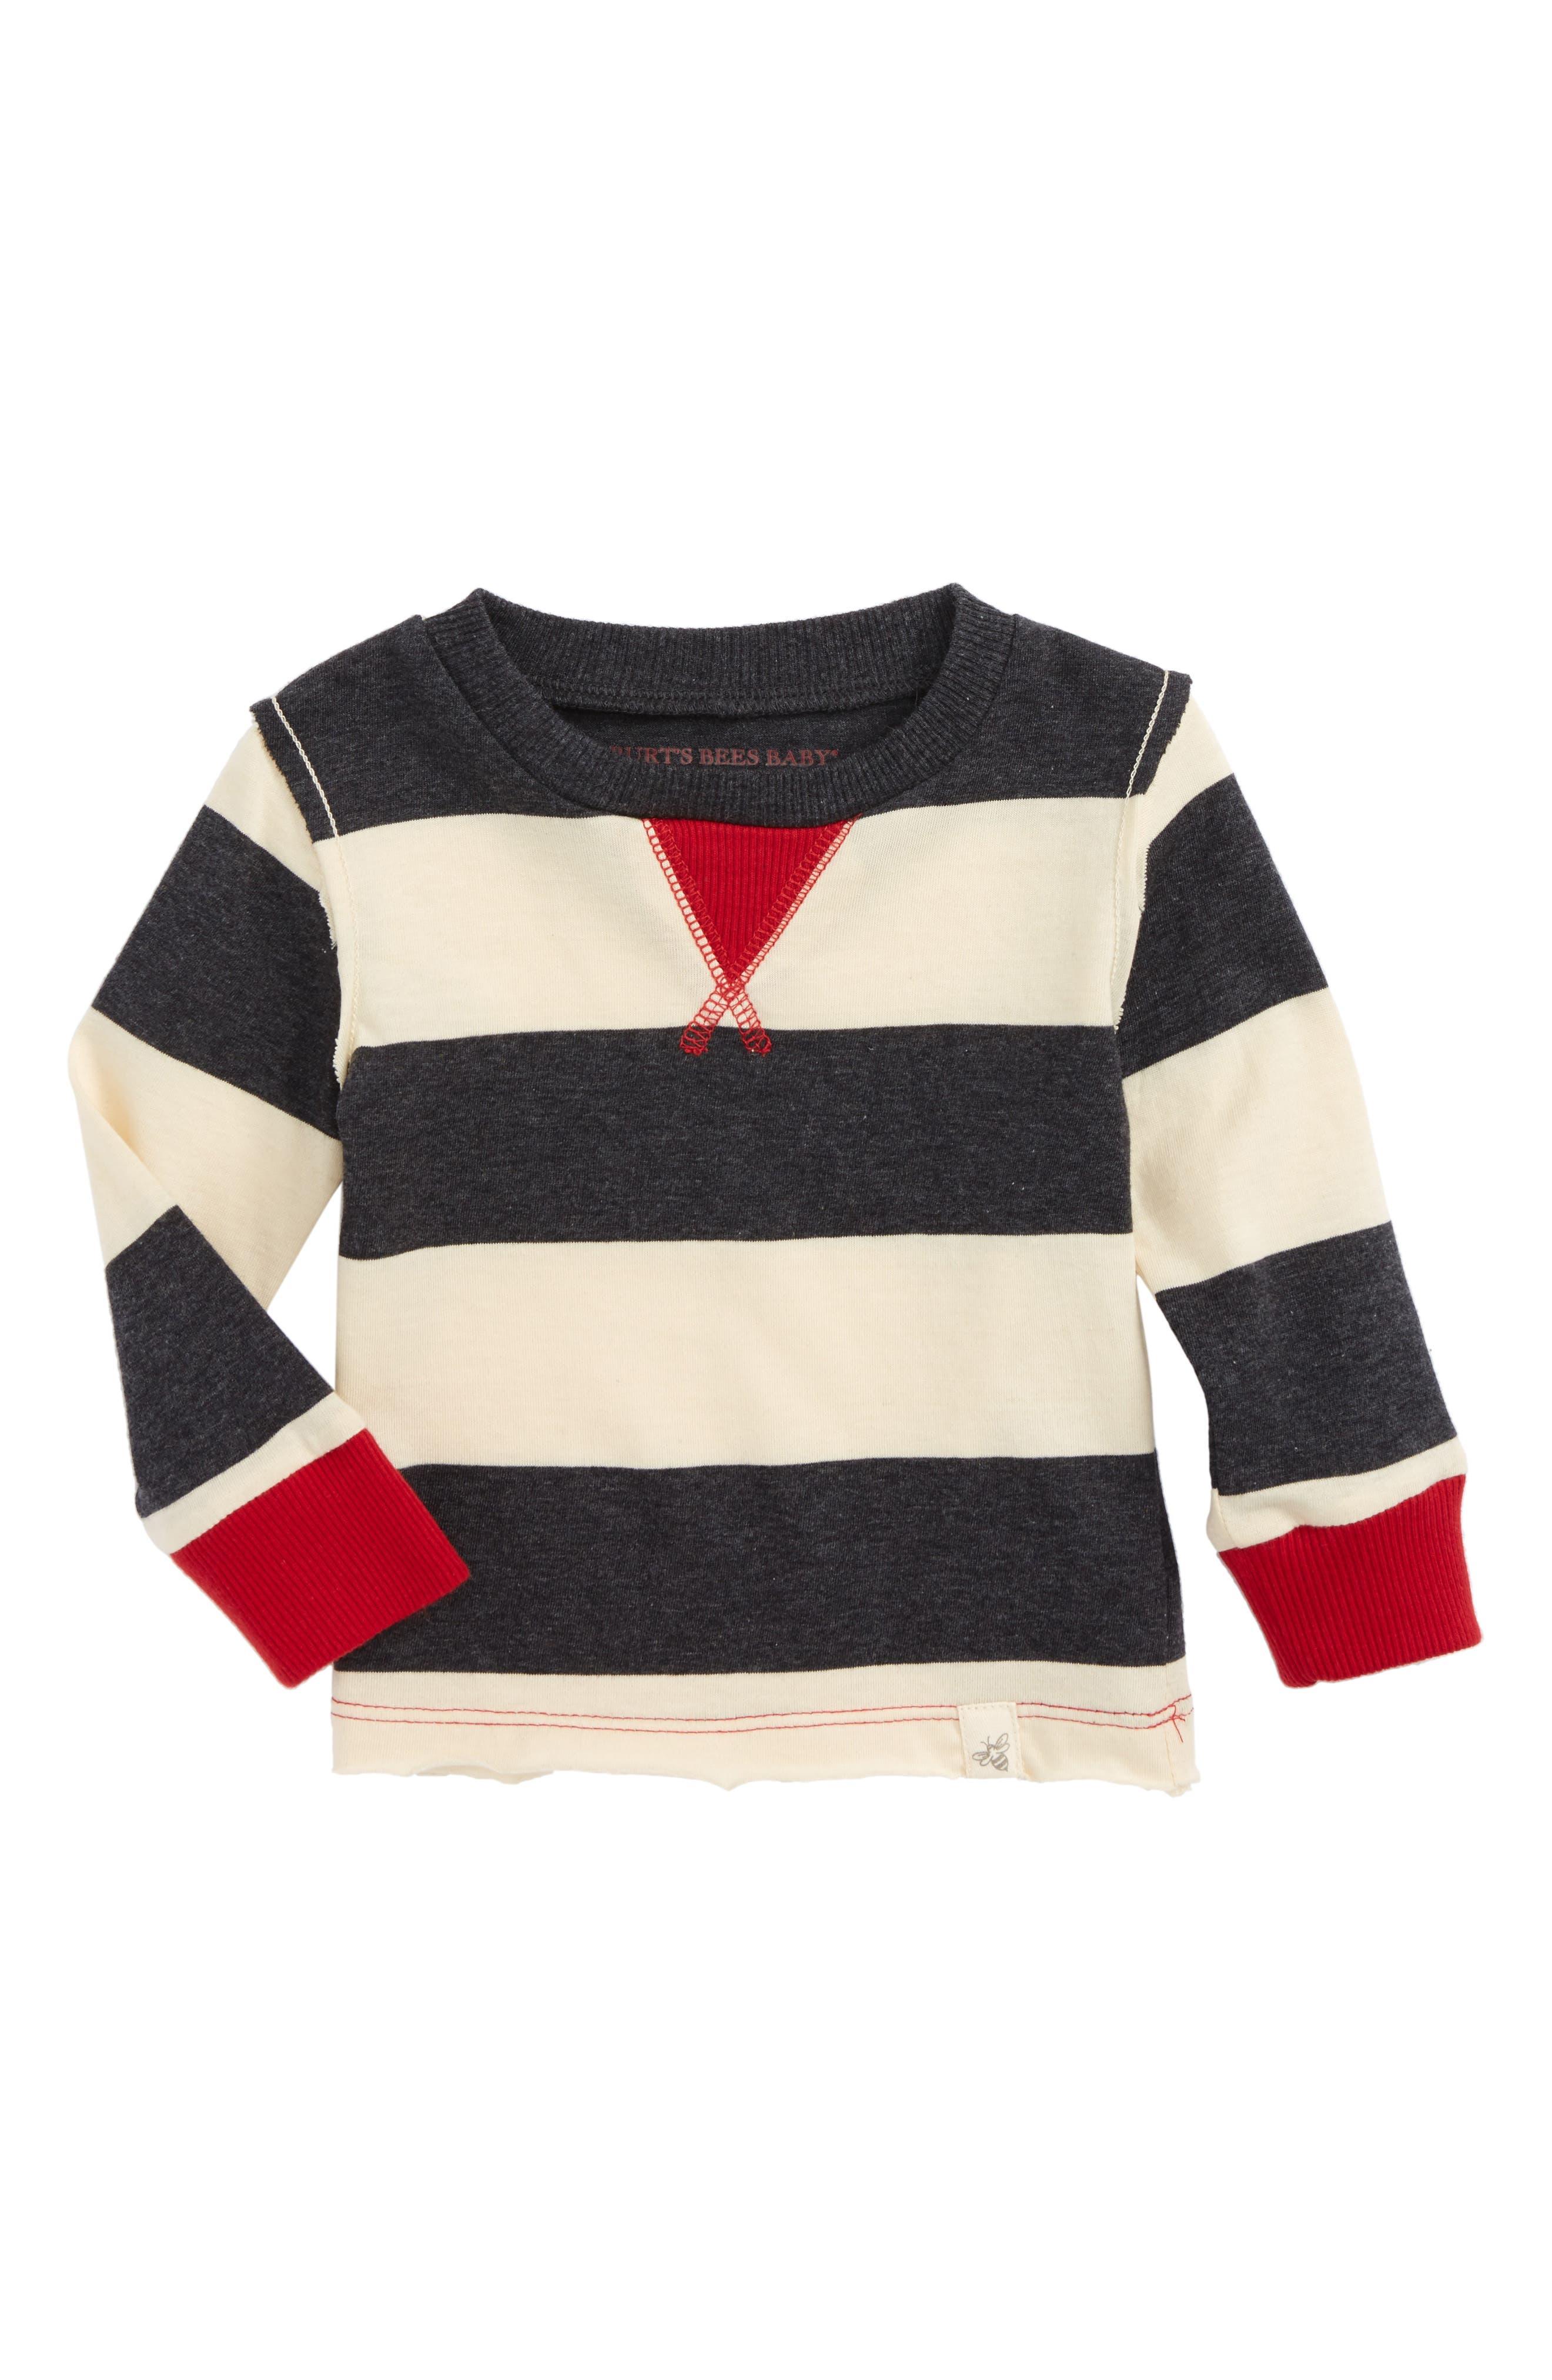 Main Image - Burt's Bees Baby Rugby Stripe Organic Cotton T-Shirt (Baby Boys)